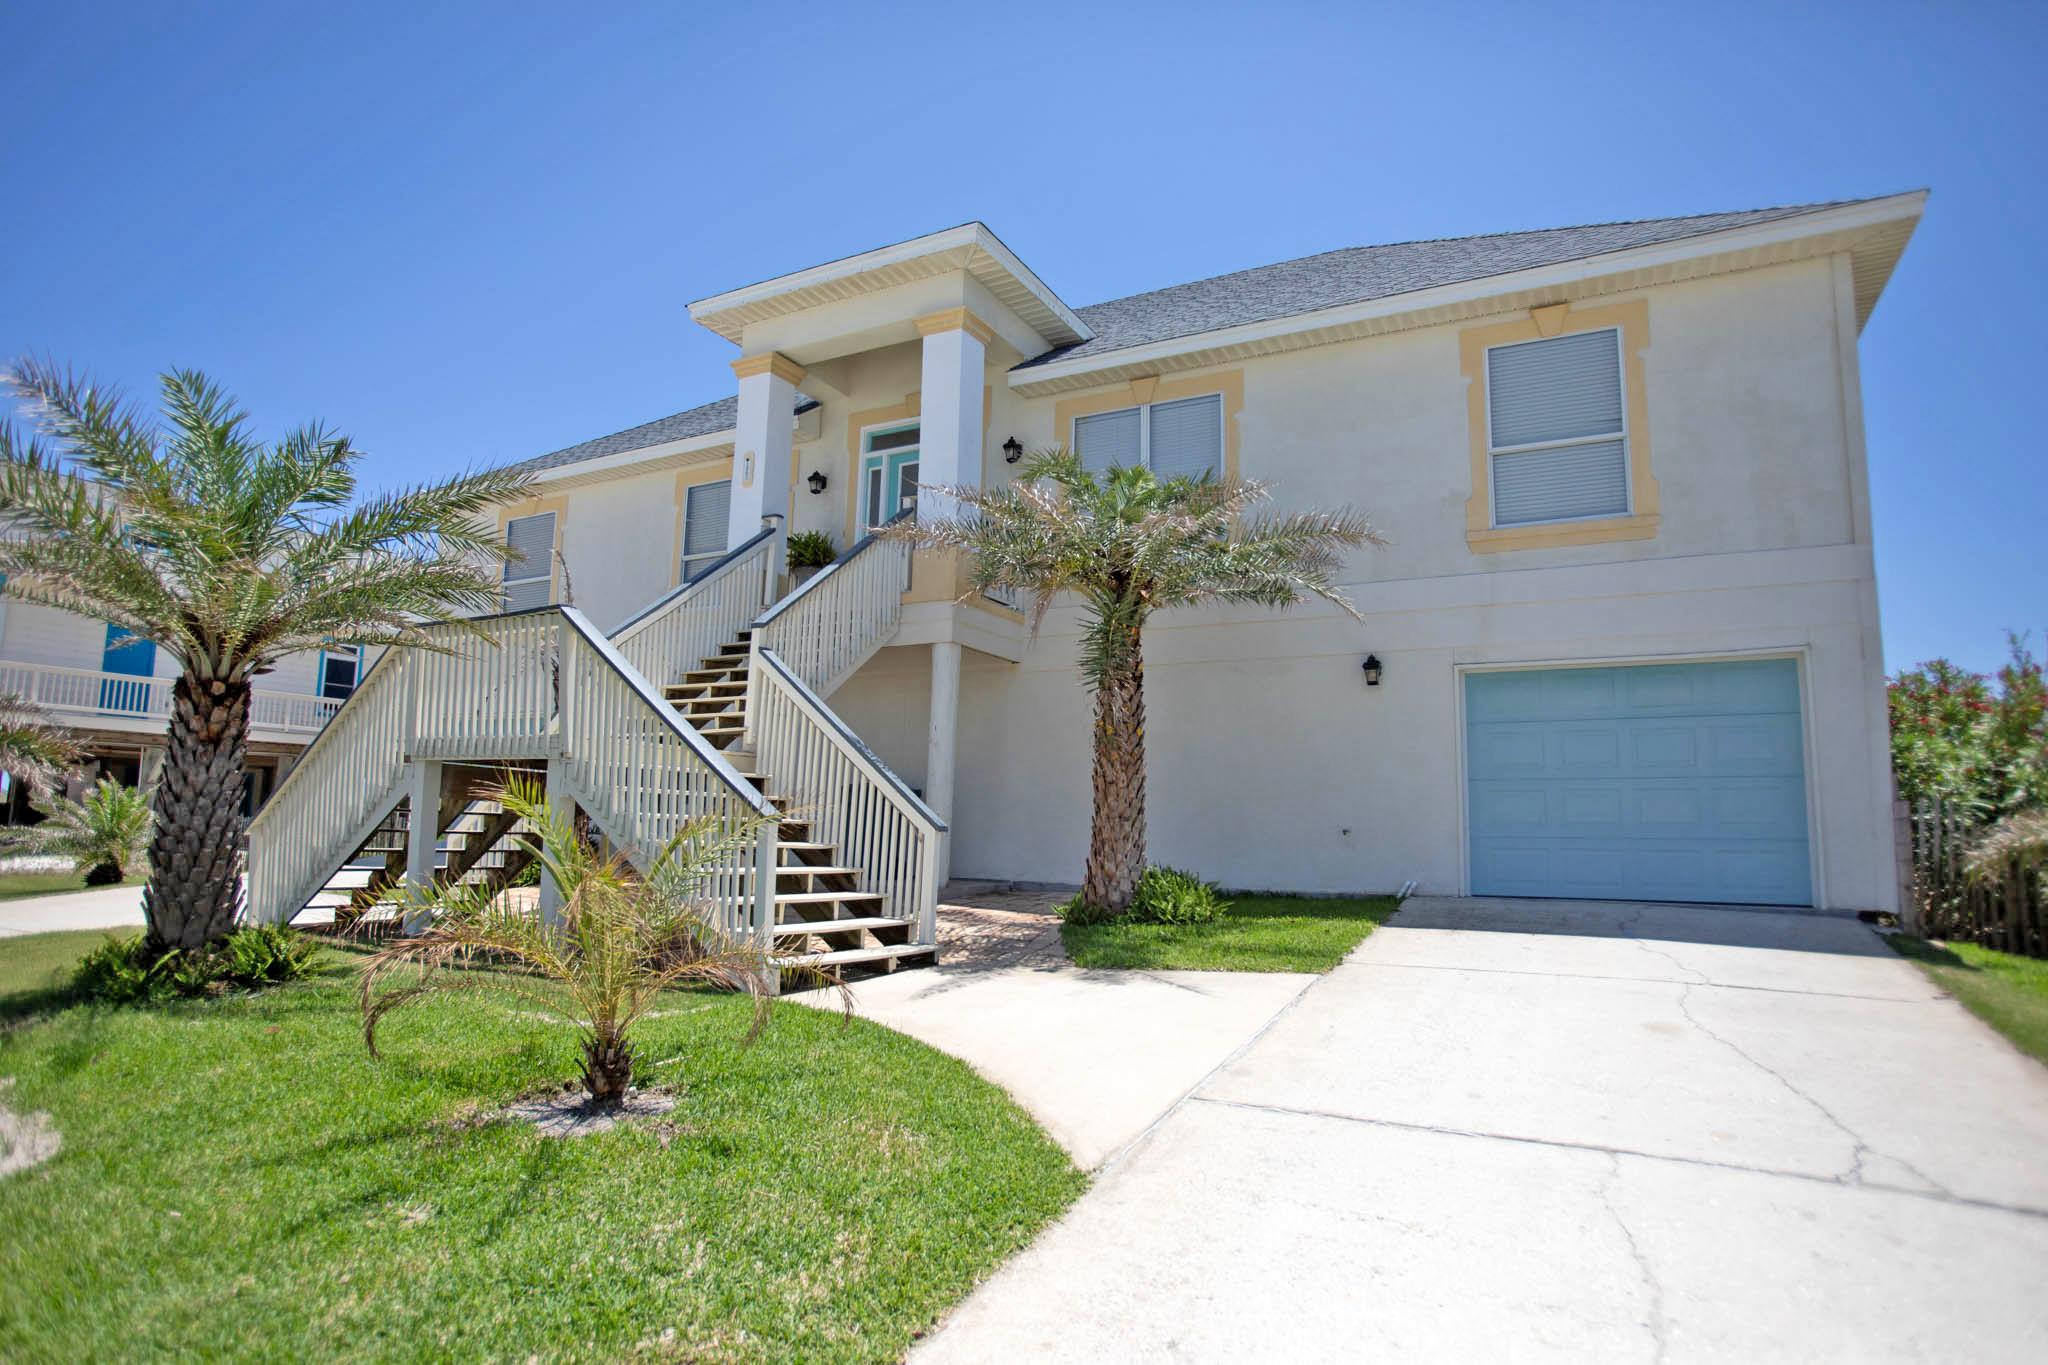 Ariola 1002 House/Cottage rental in Pensacola Beach House Rentals in Pensacola Beach Florida - #1